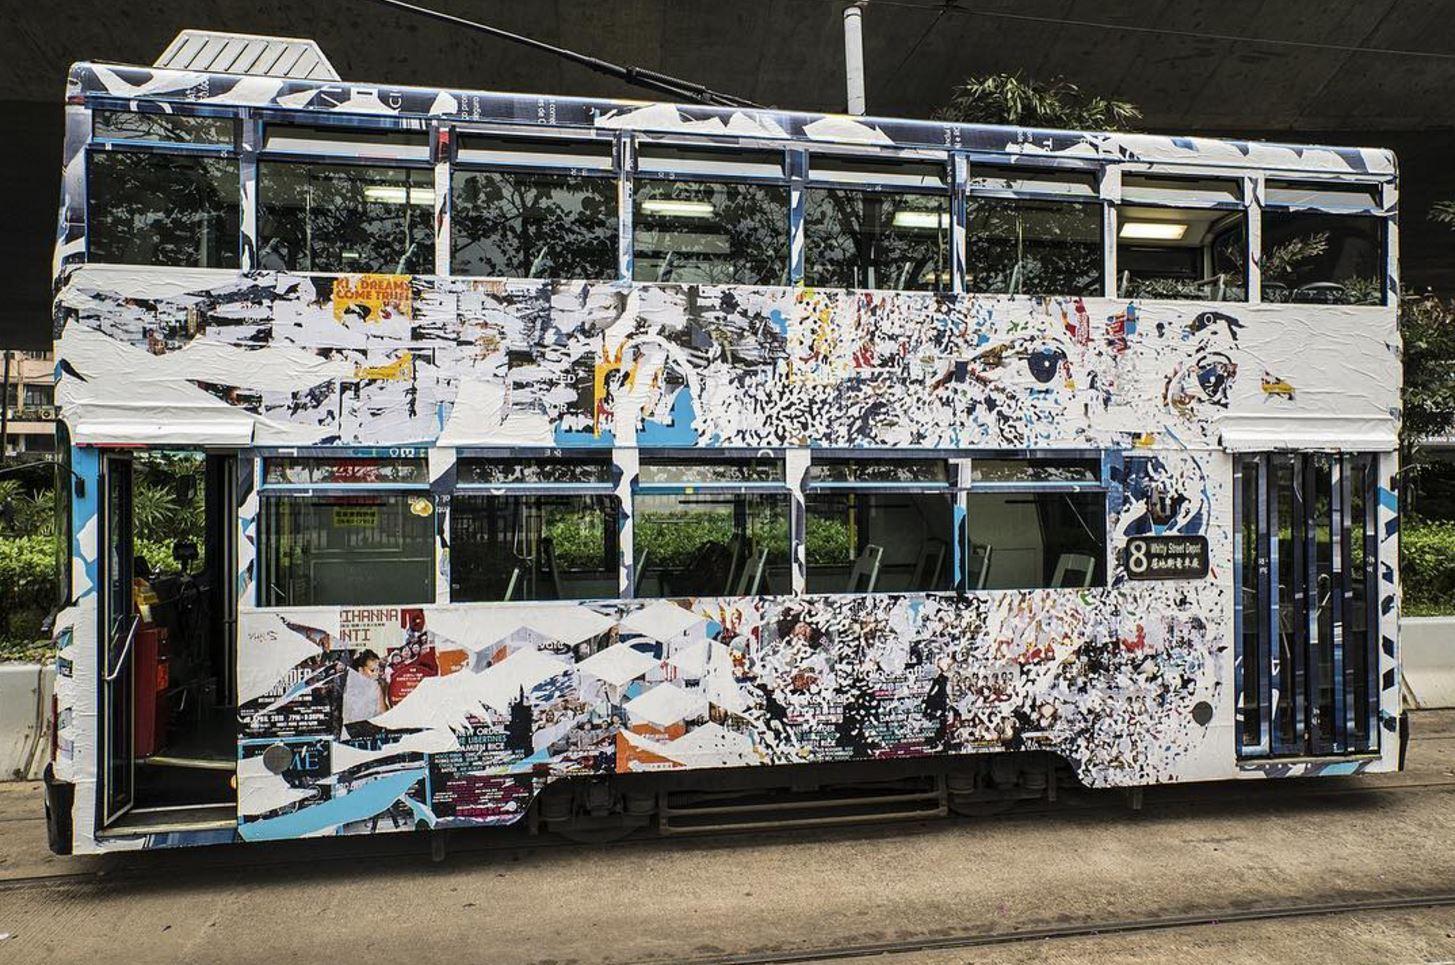 vhils graffiti escutura vandalismo dionisio arte (12)